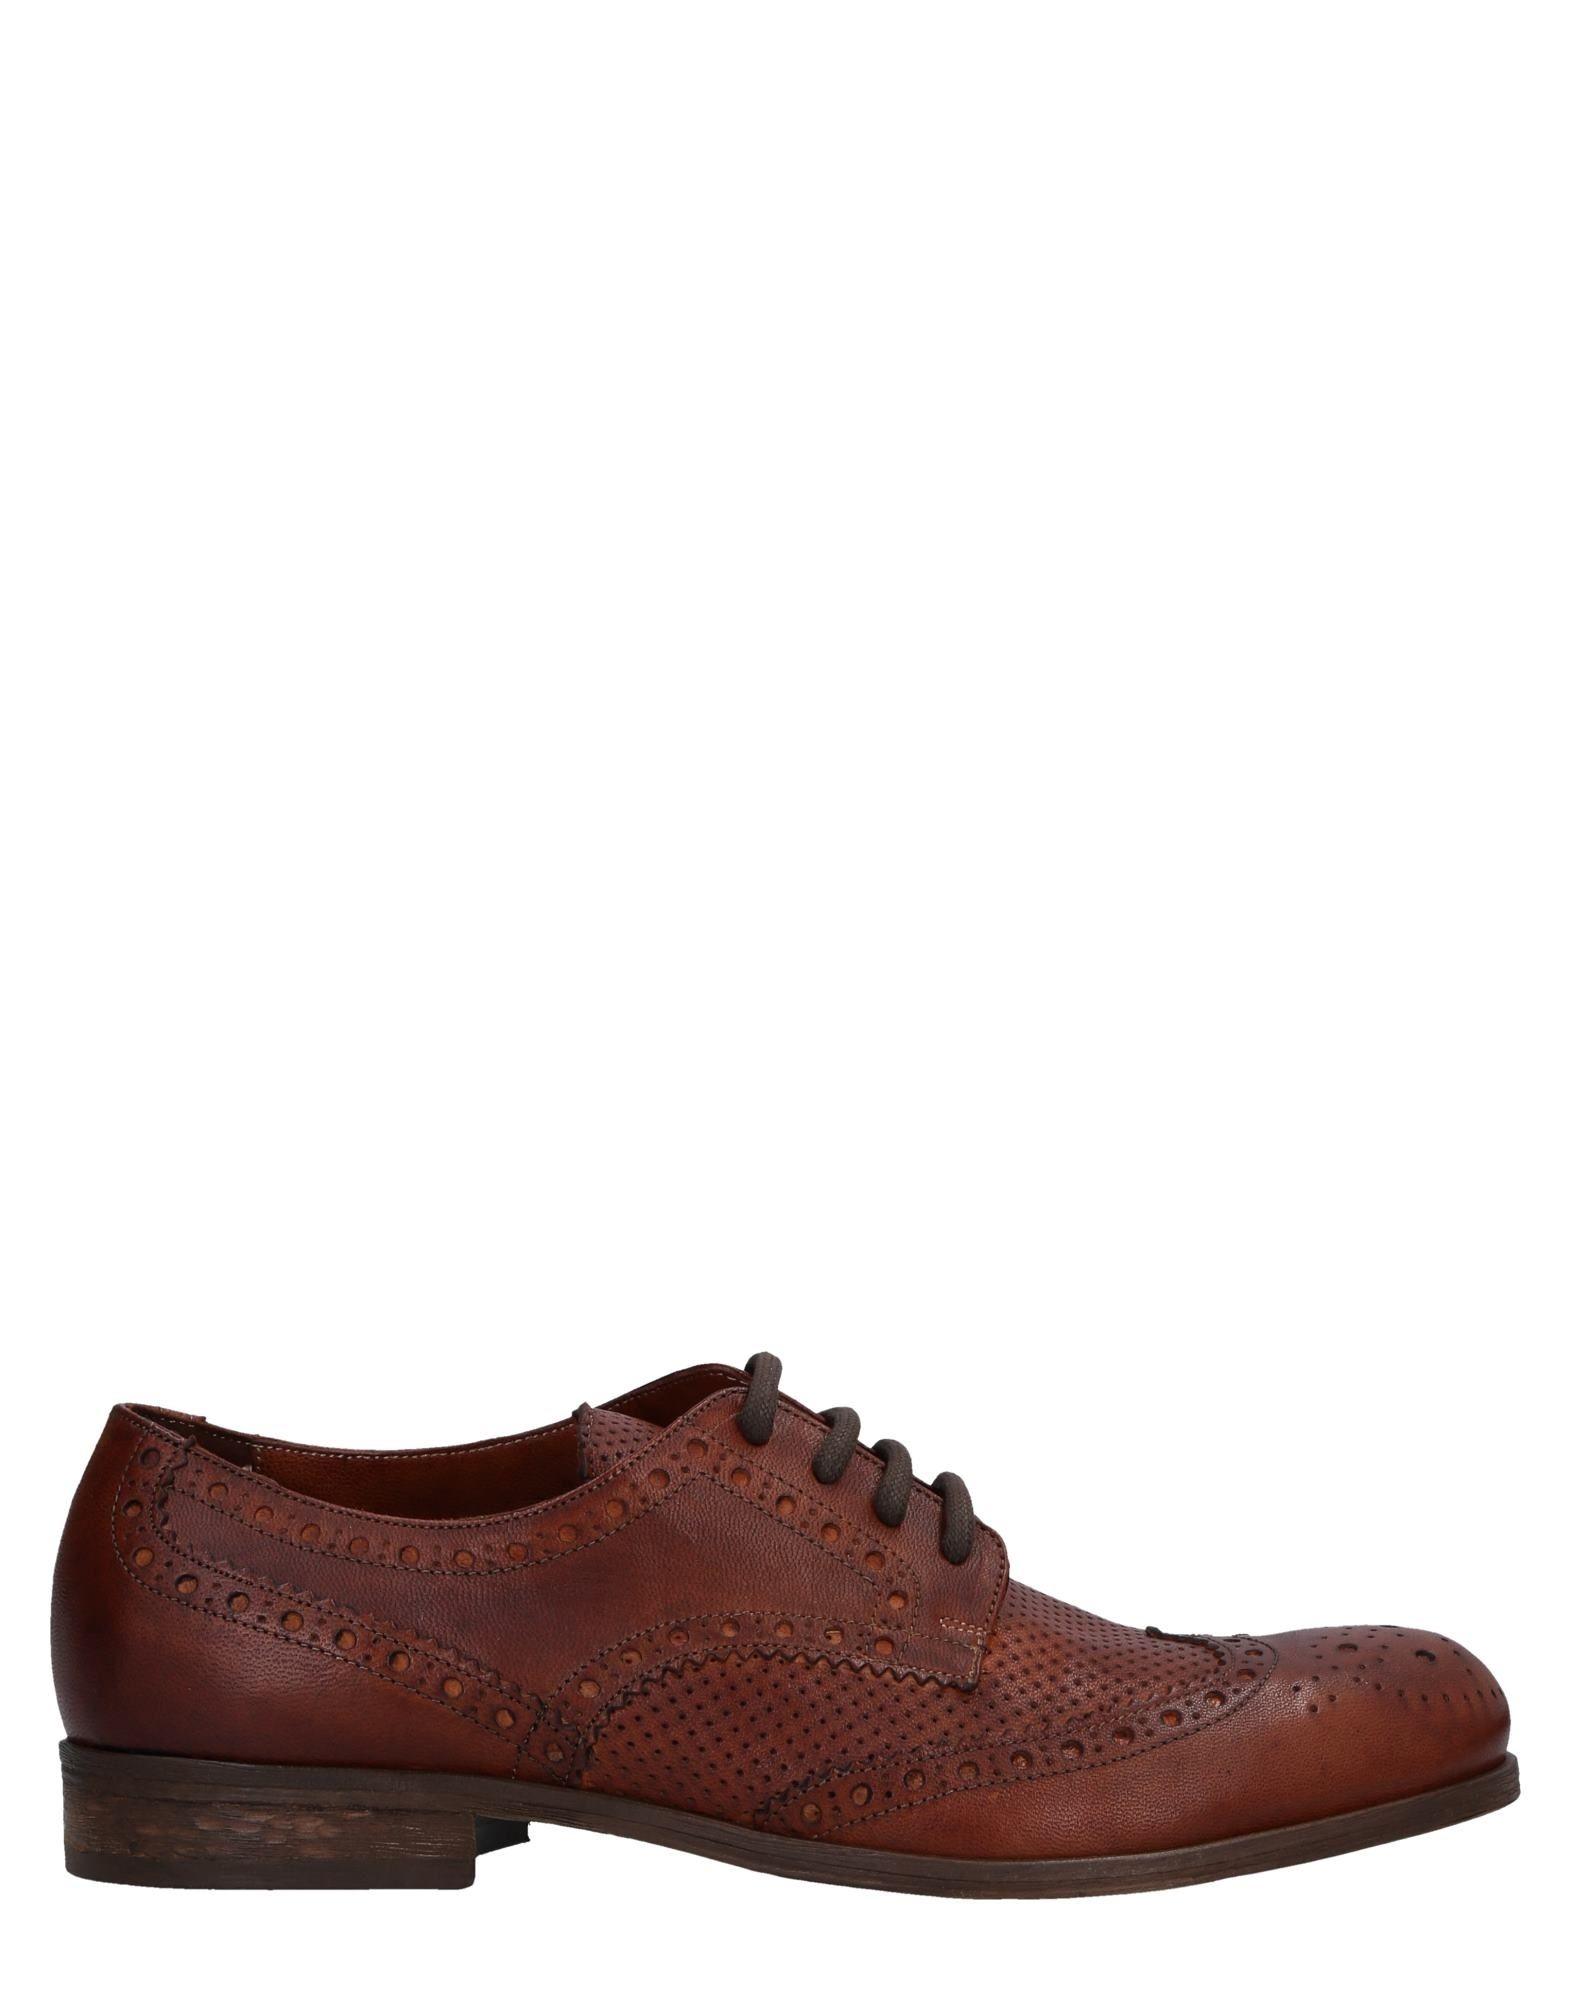 Фото - MINORONZONI Обувь на шнурках обувь на высокой платформе dkny